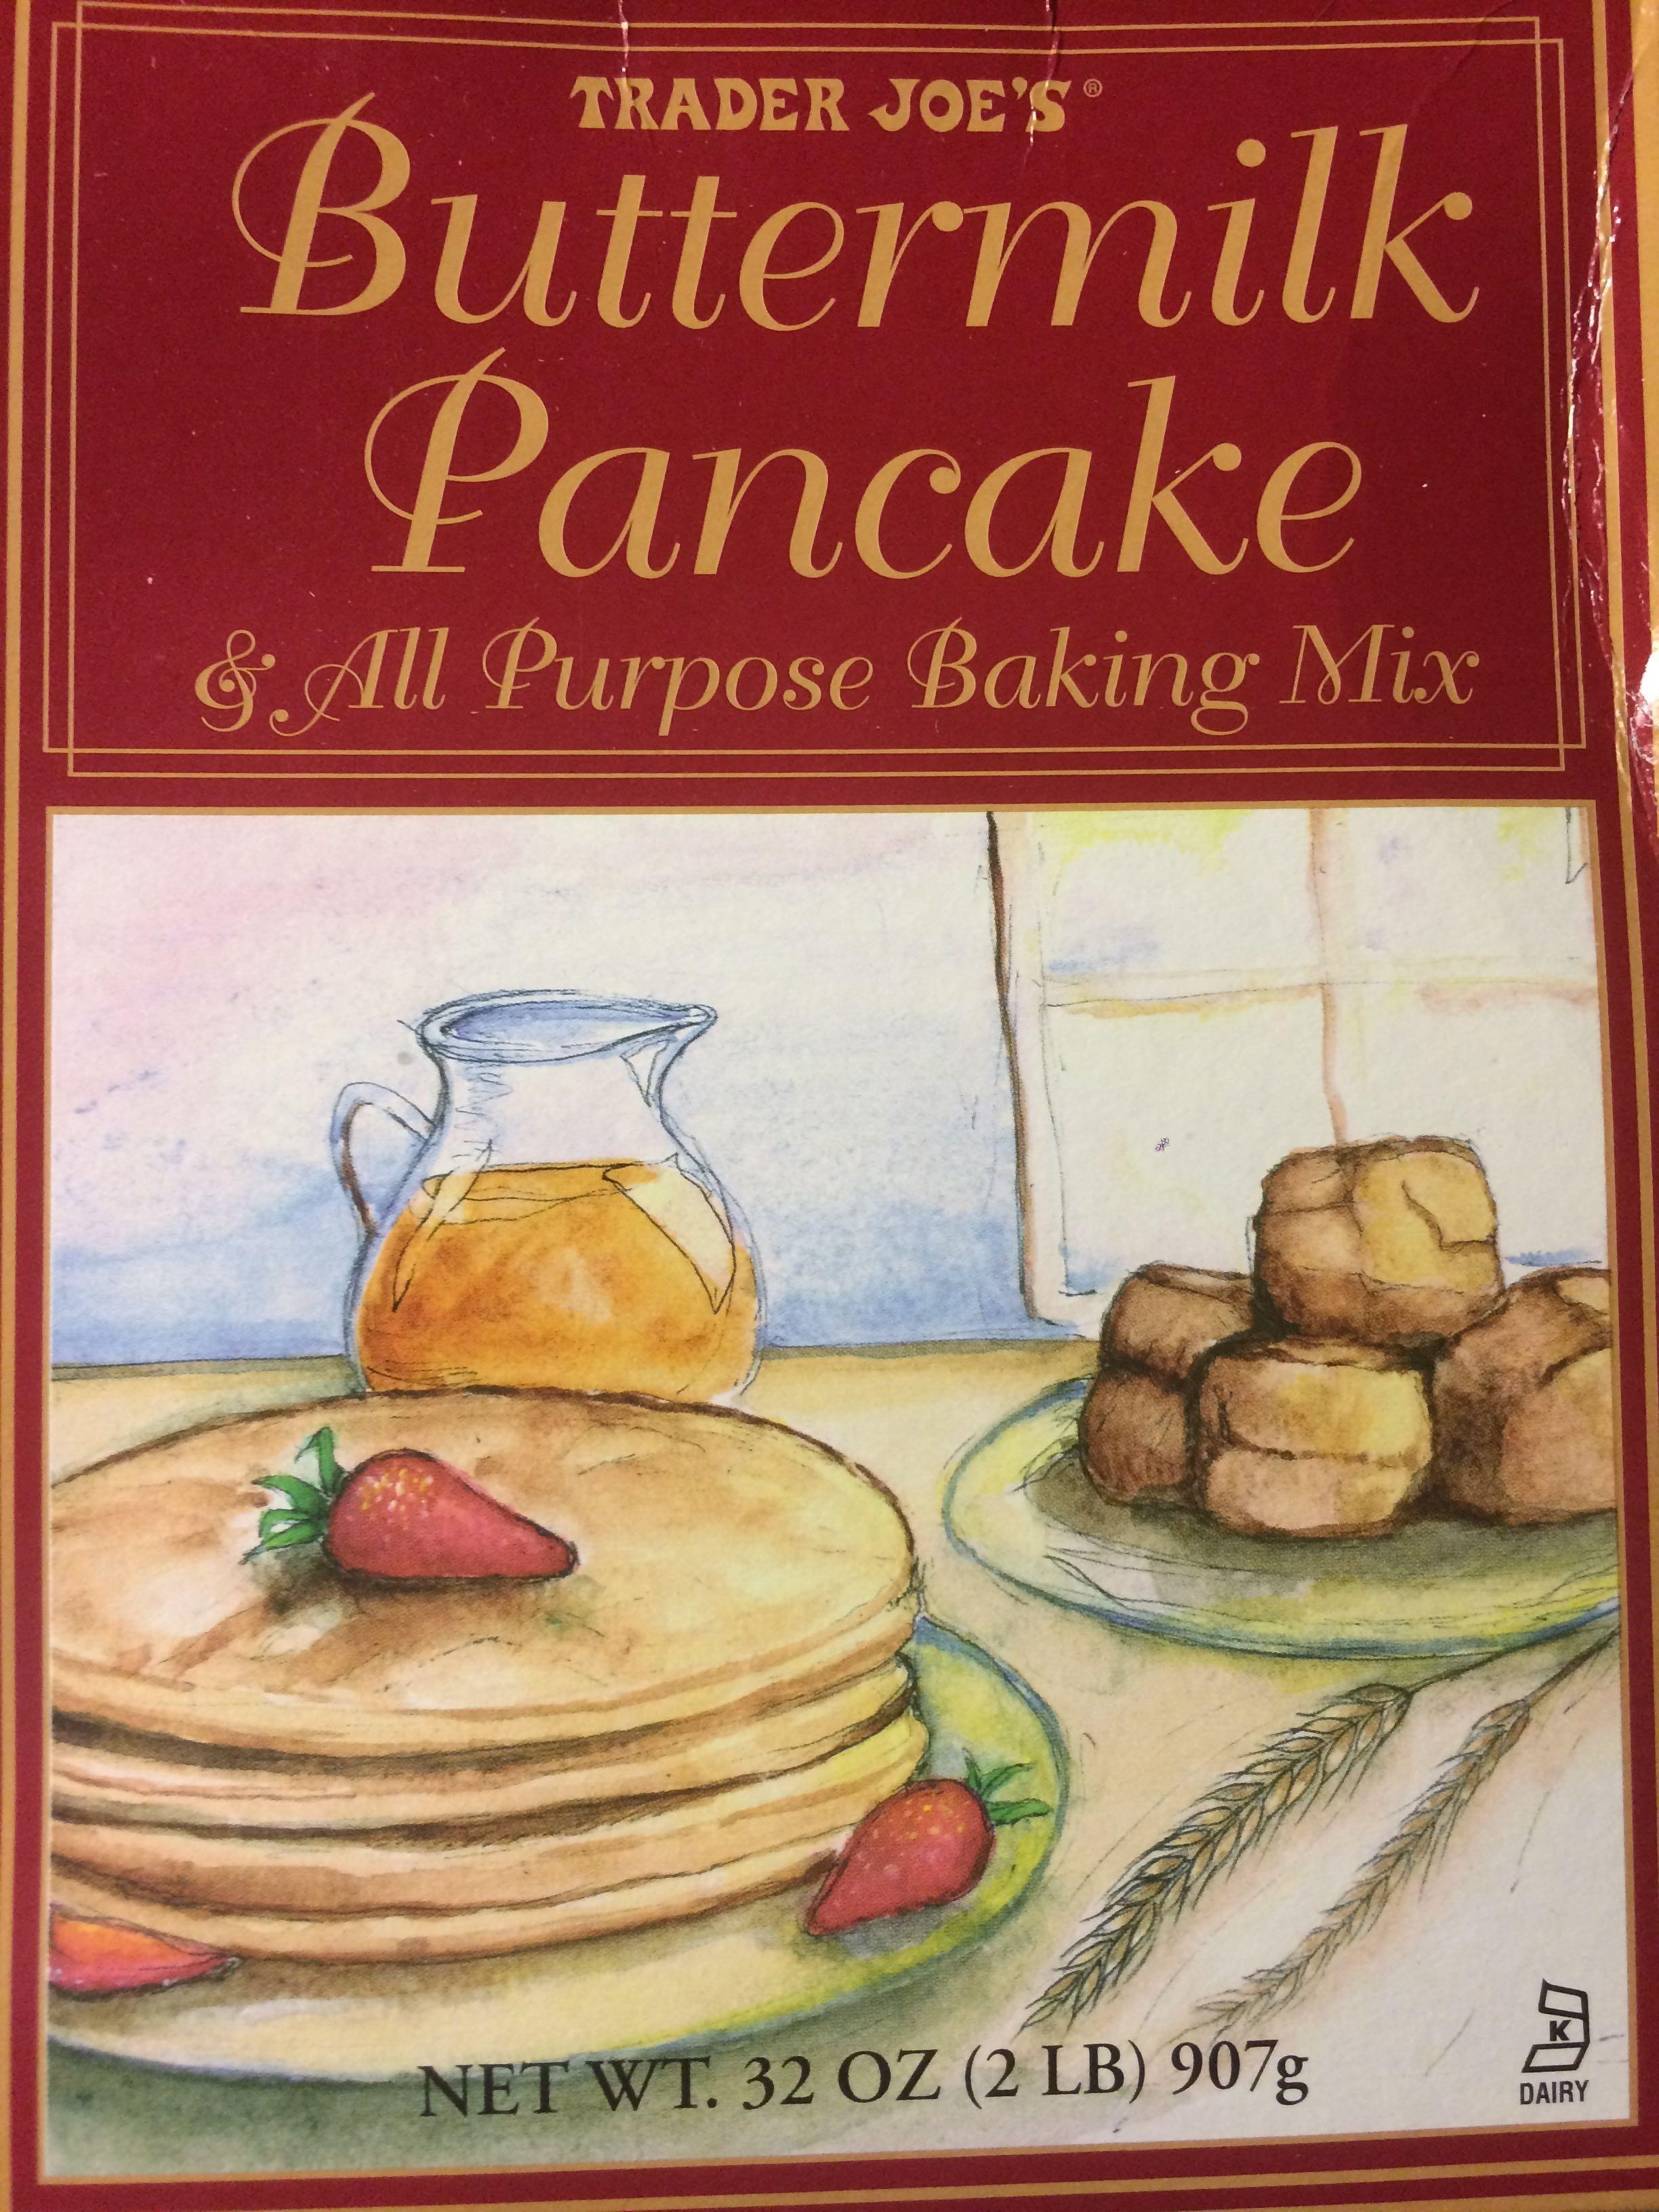 Buttermilk Pancake - Produit - fr